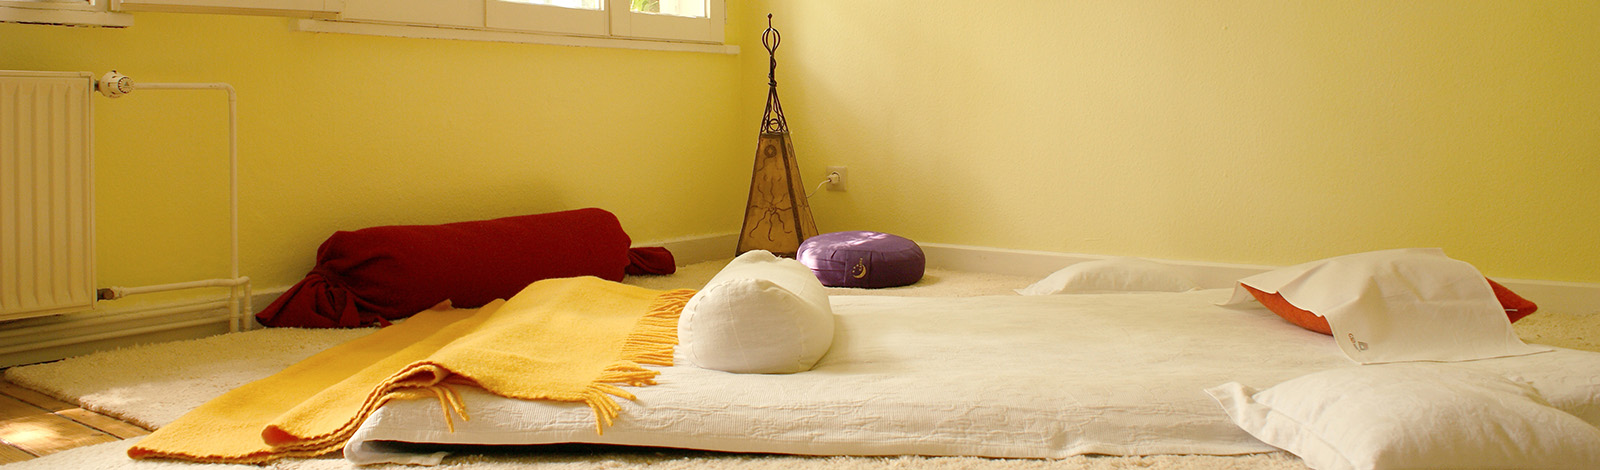 Shiatsu-Münster-Massage-Meditation Raum